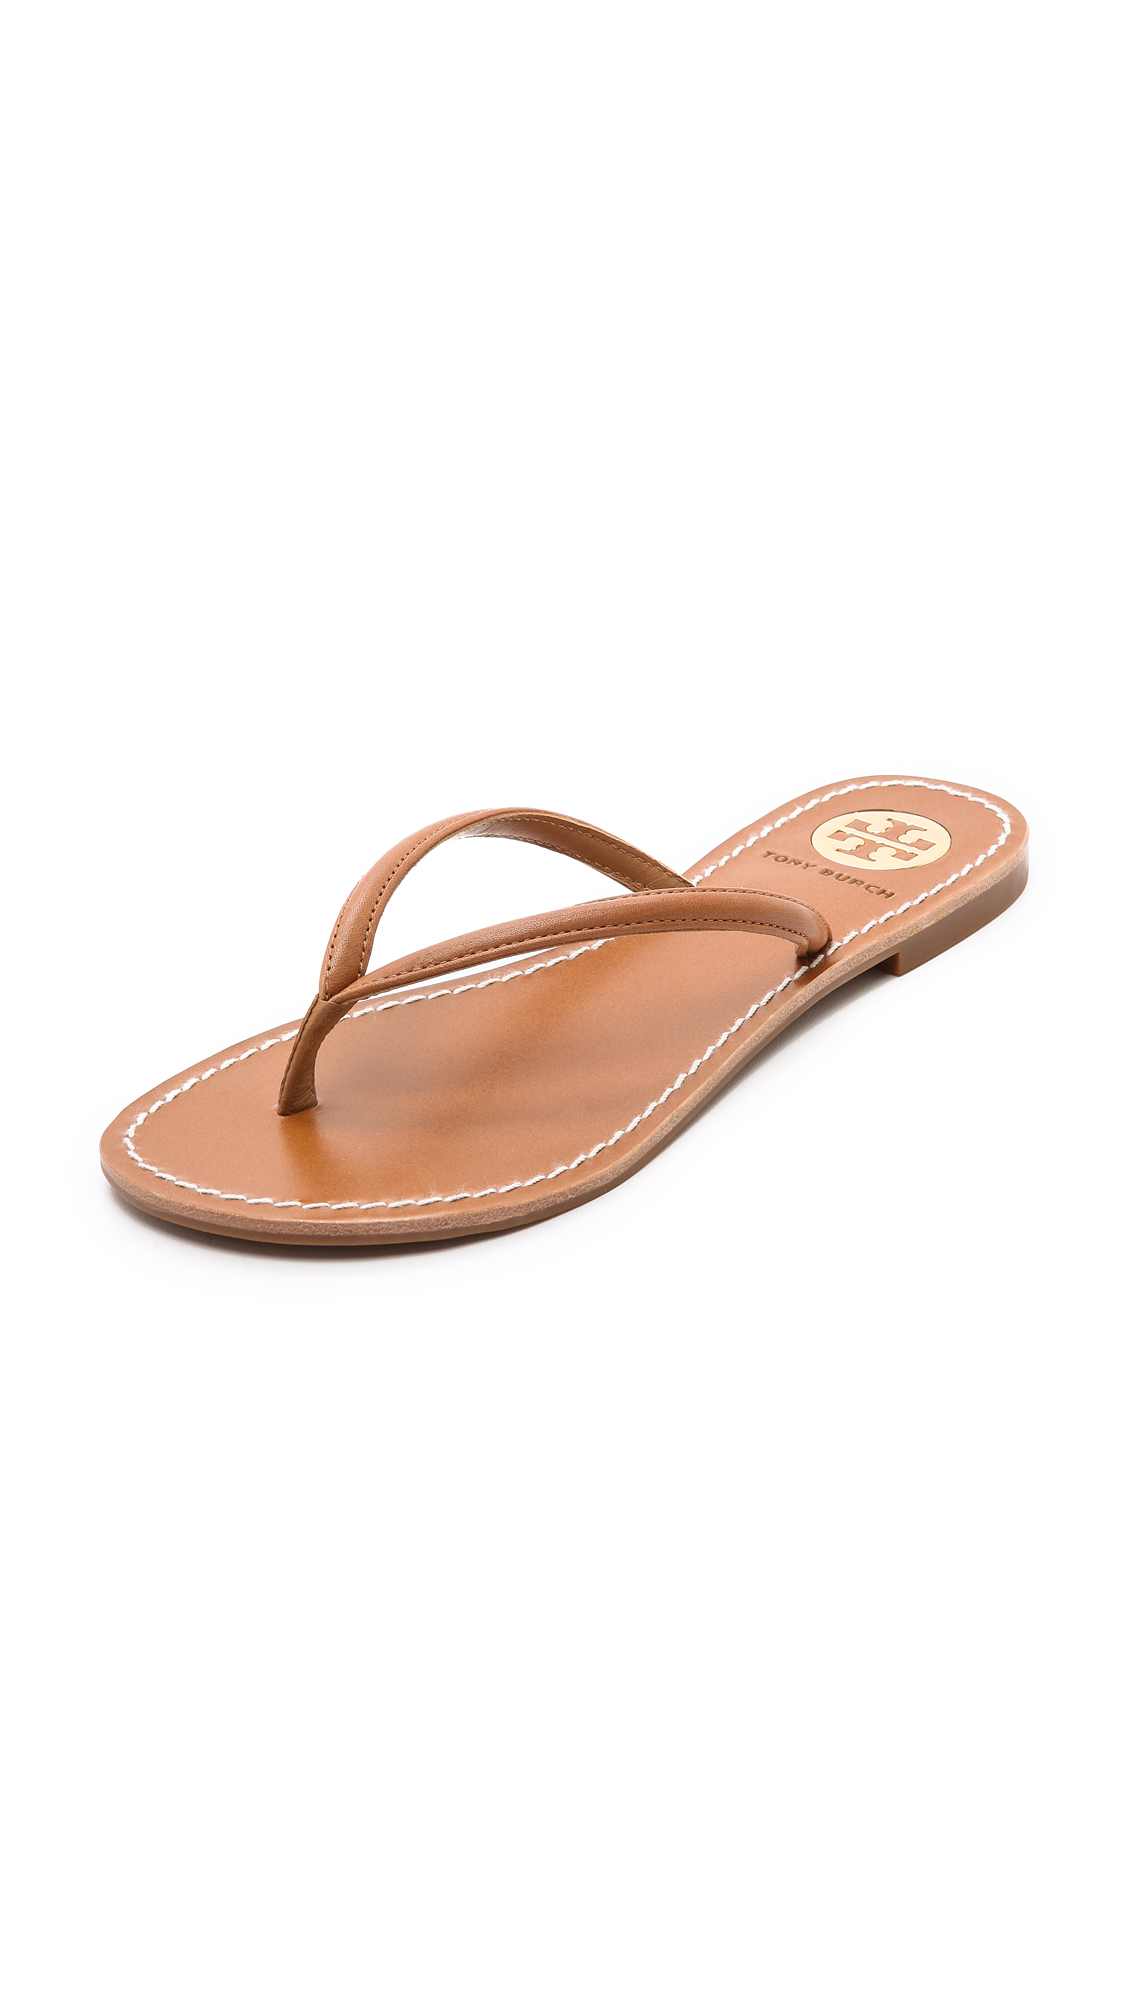 Lyst - Tory Burch Abitha Flip Flops In Brown-7608